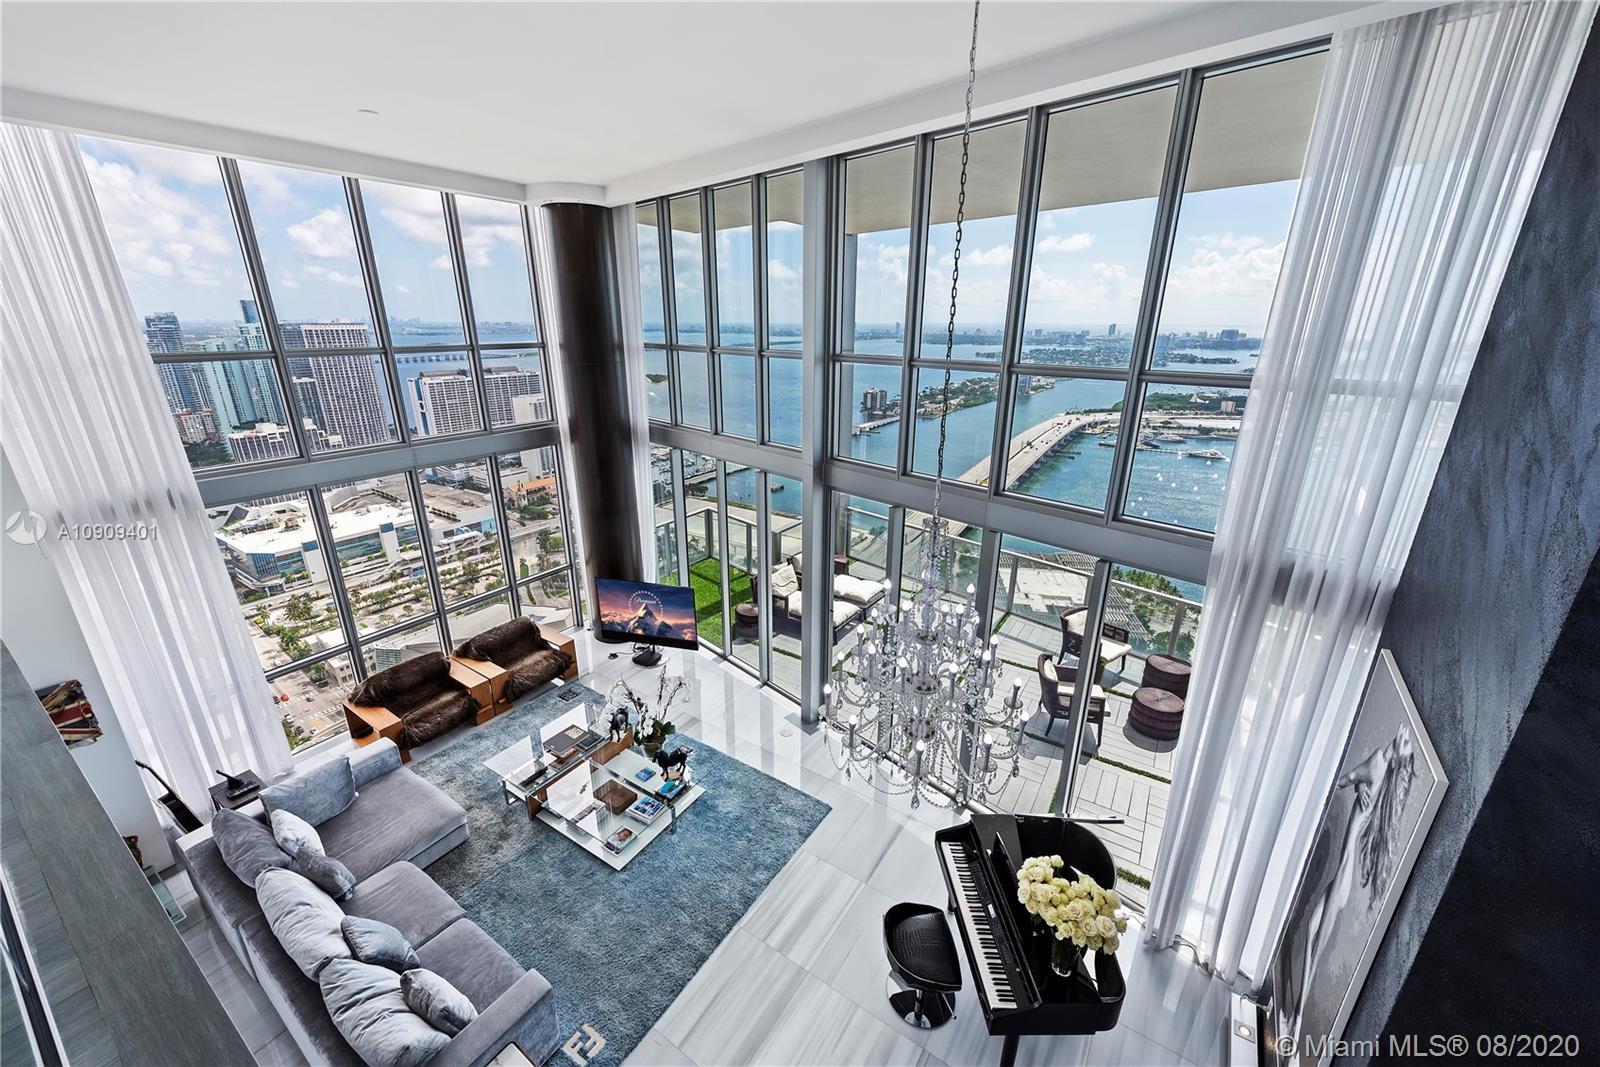 Majestic & unique combined condo units in the hottest location in Downtown Miami. No expense spared